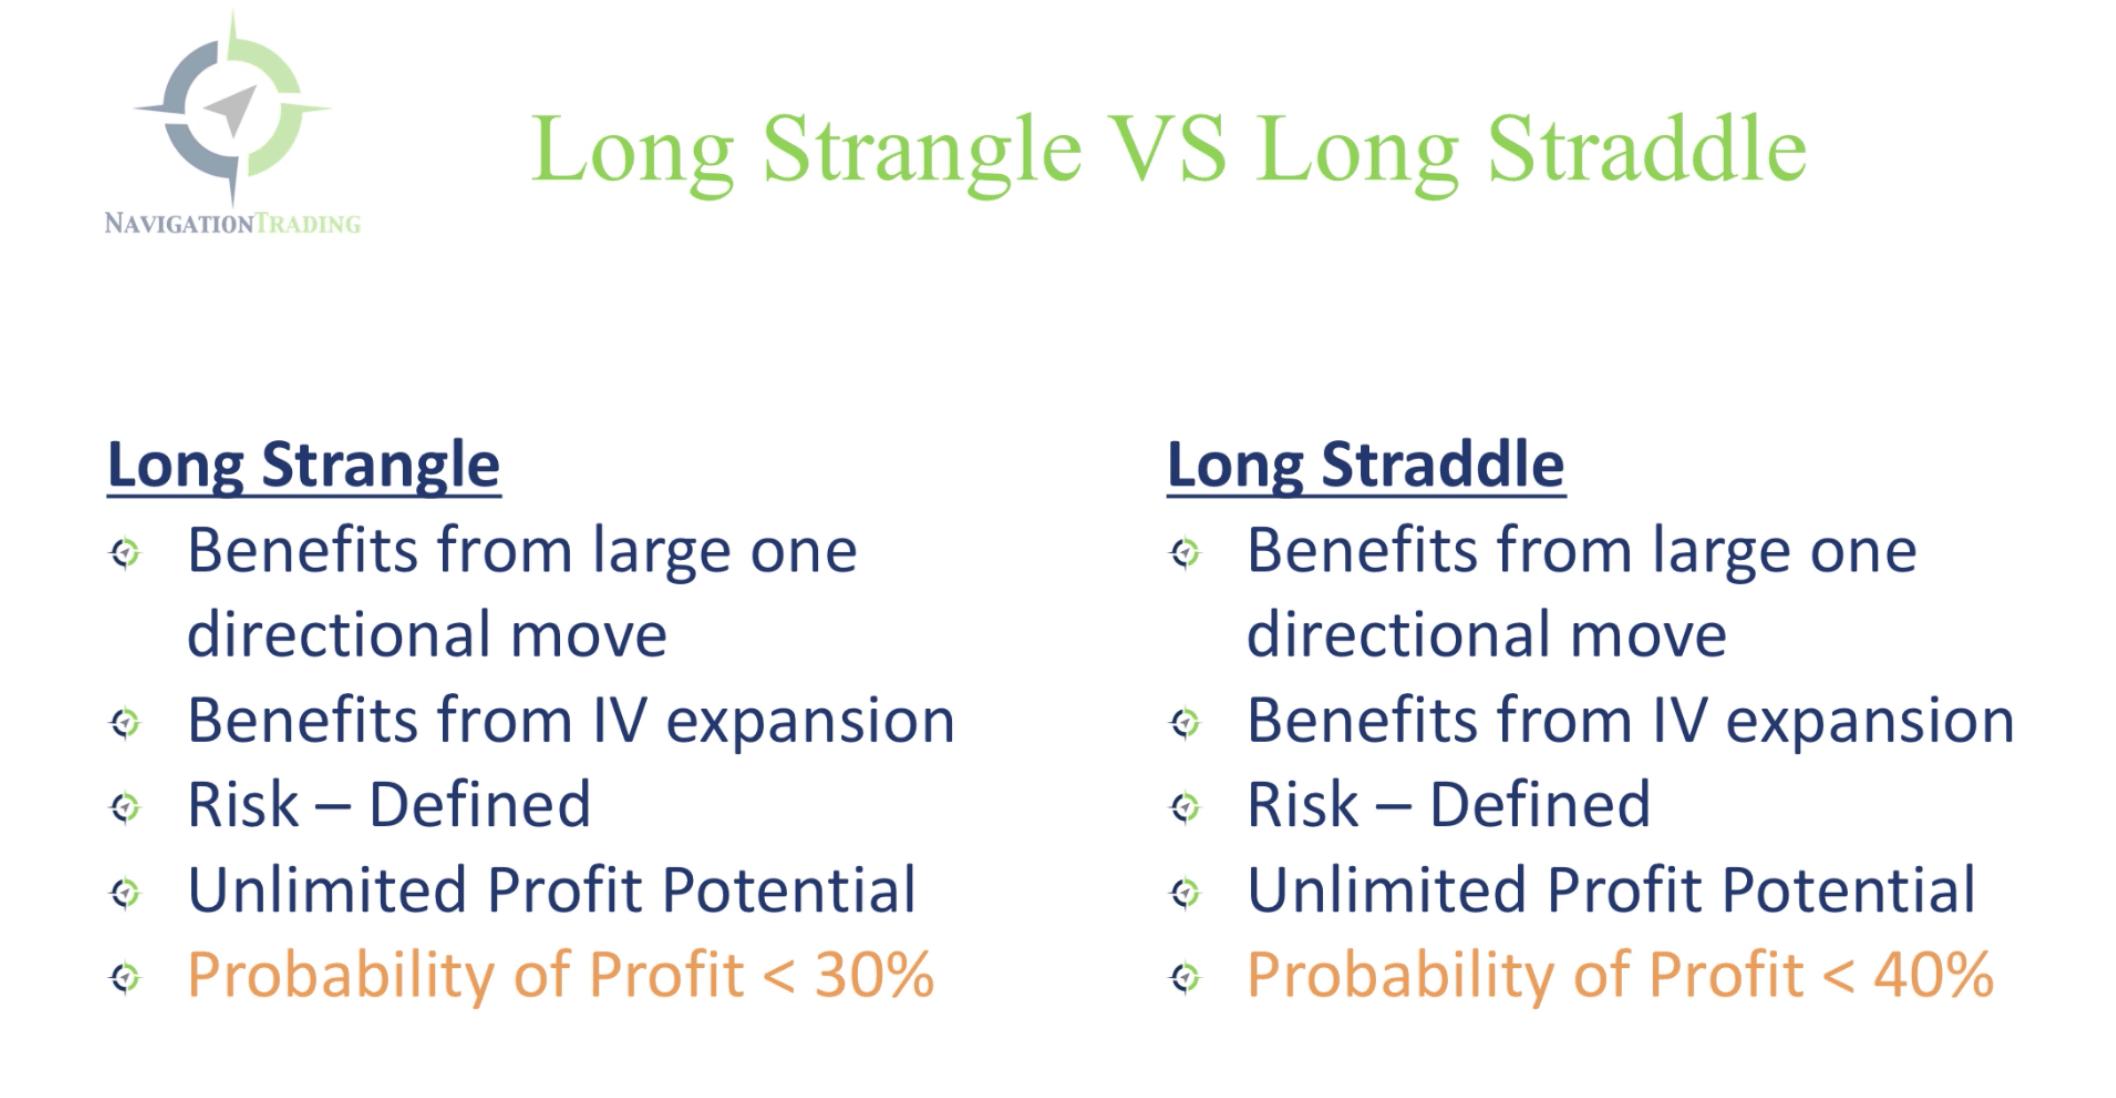 Long Strangle vs. Long Straddle T-chart